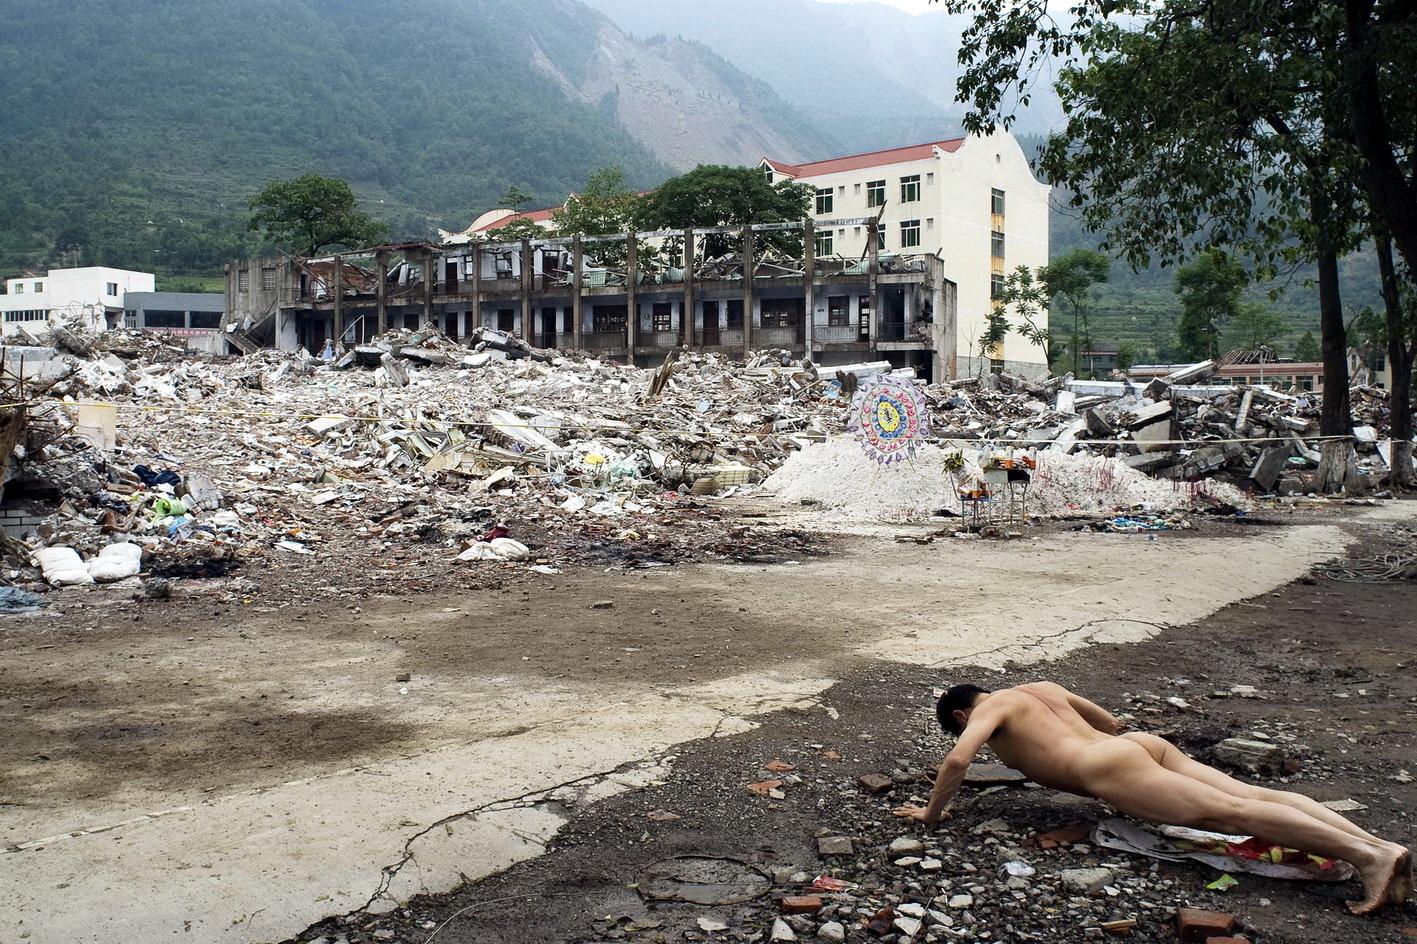 14:28 May 12 2008, Wenchuan Earthquake, No.1